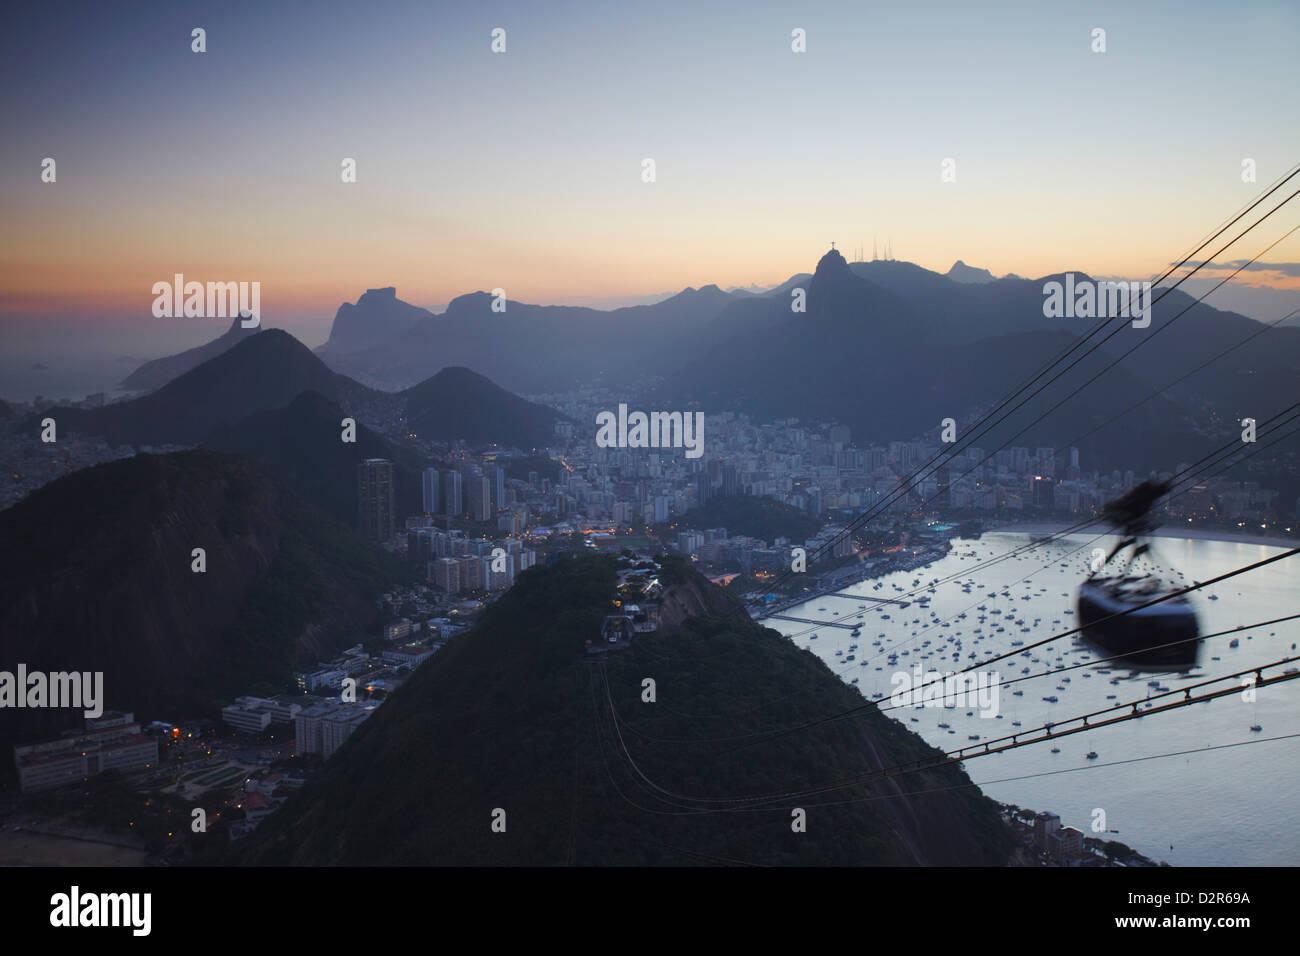 Vista del río desde la Montaña Pan de Azúcar, Rio de Janeiro, Brasil, América del Sur Imagen De Stock